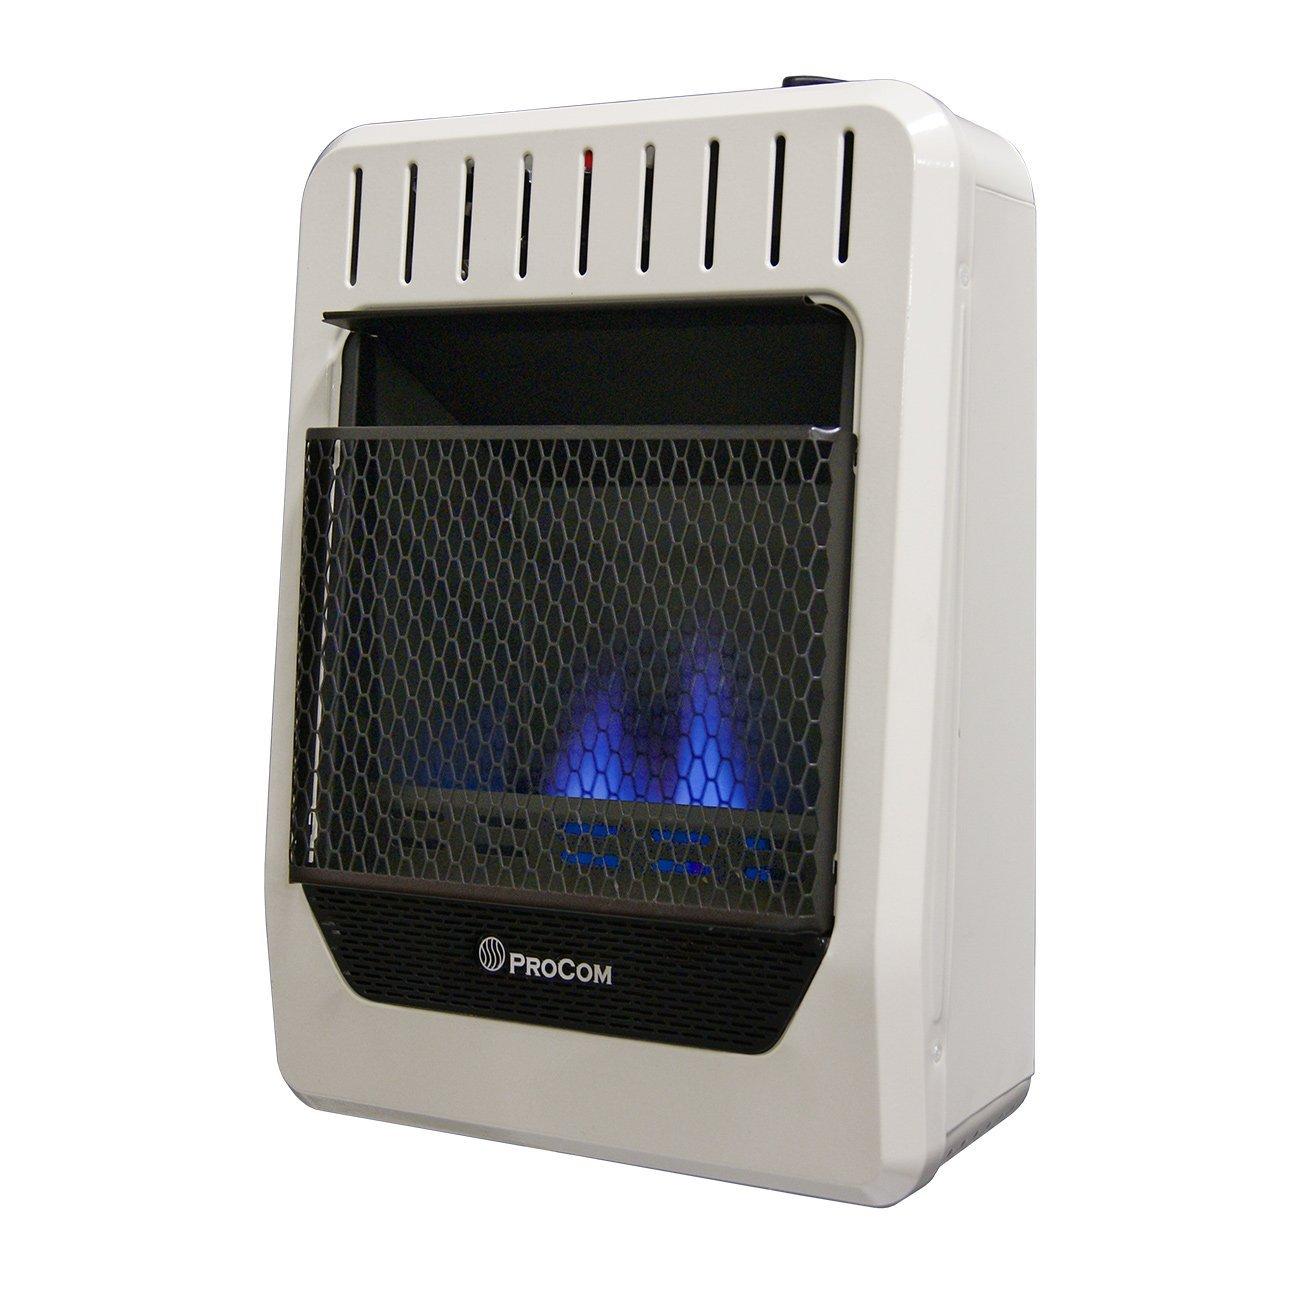 ProCom Heating Ventless INC MGH10BF 10,000 BTU Dual Fuel Blue Flame Gas Wall Heater, White by ProCom Heating